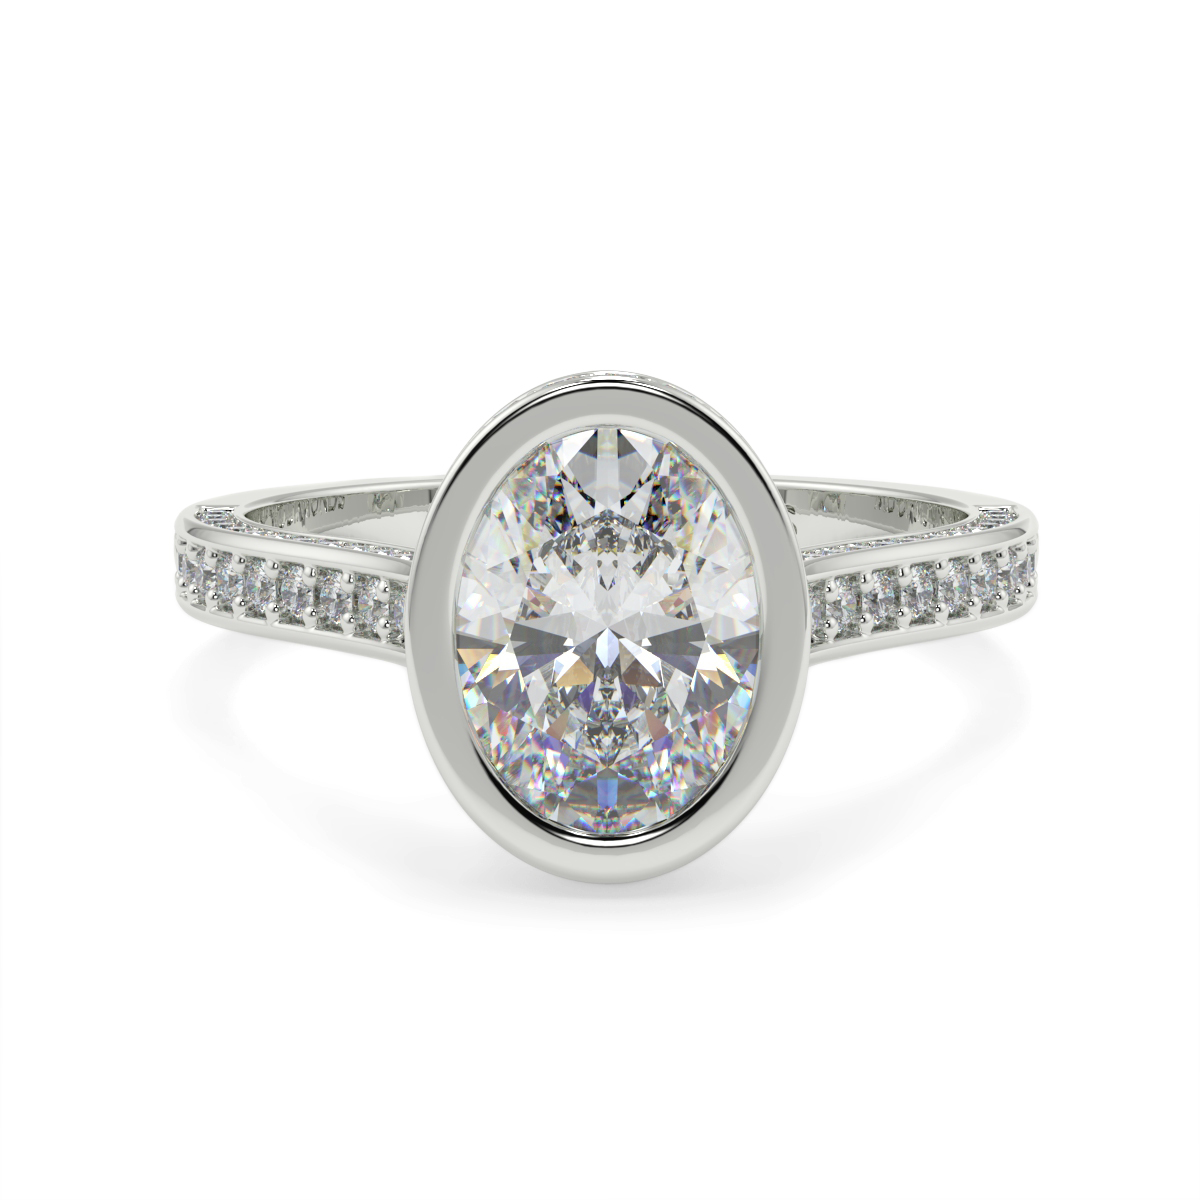 Oval Pave Set Rubover Diamond Ring